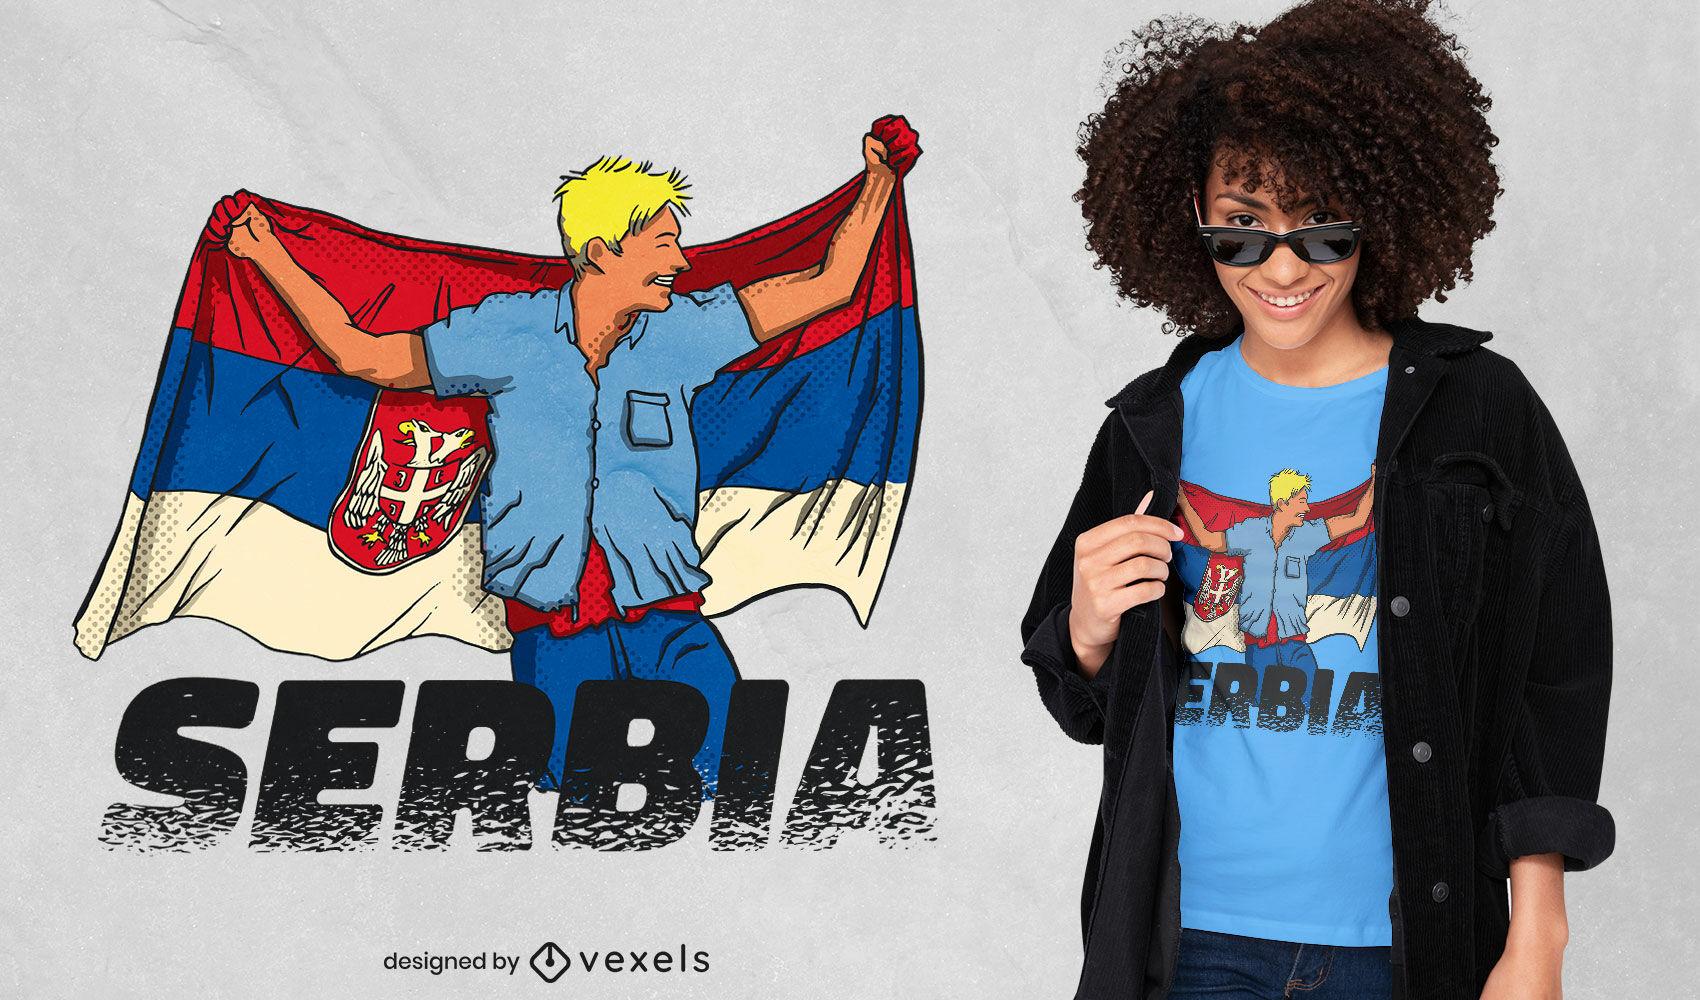 Junge hält serbisches Flaggen-T-Shirt-Design